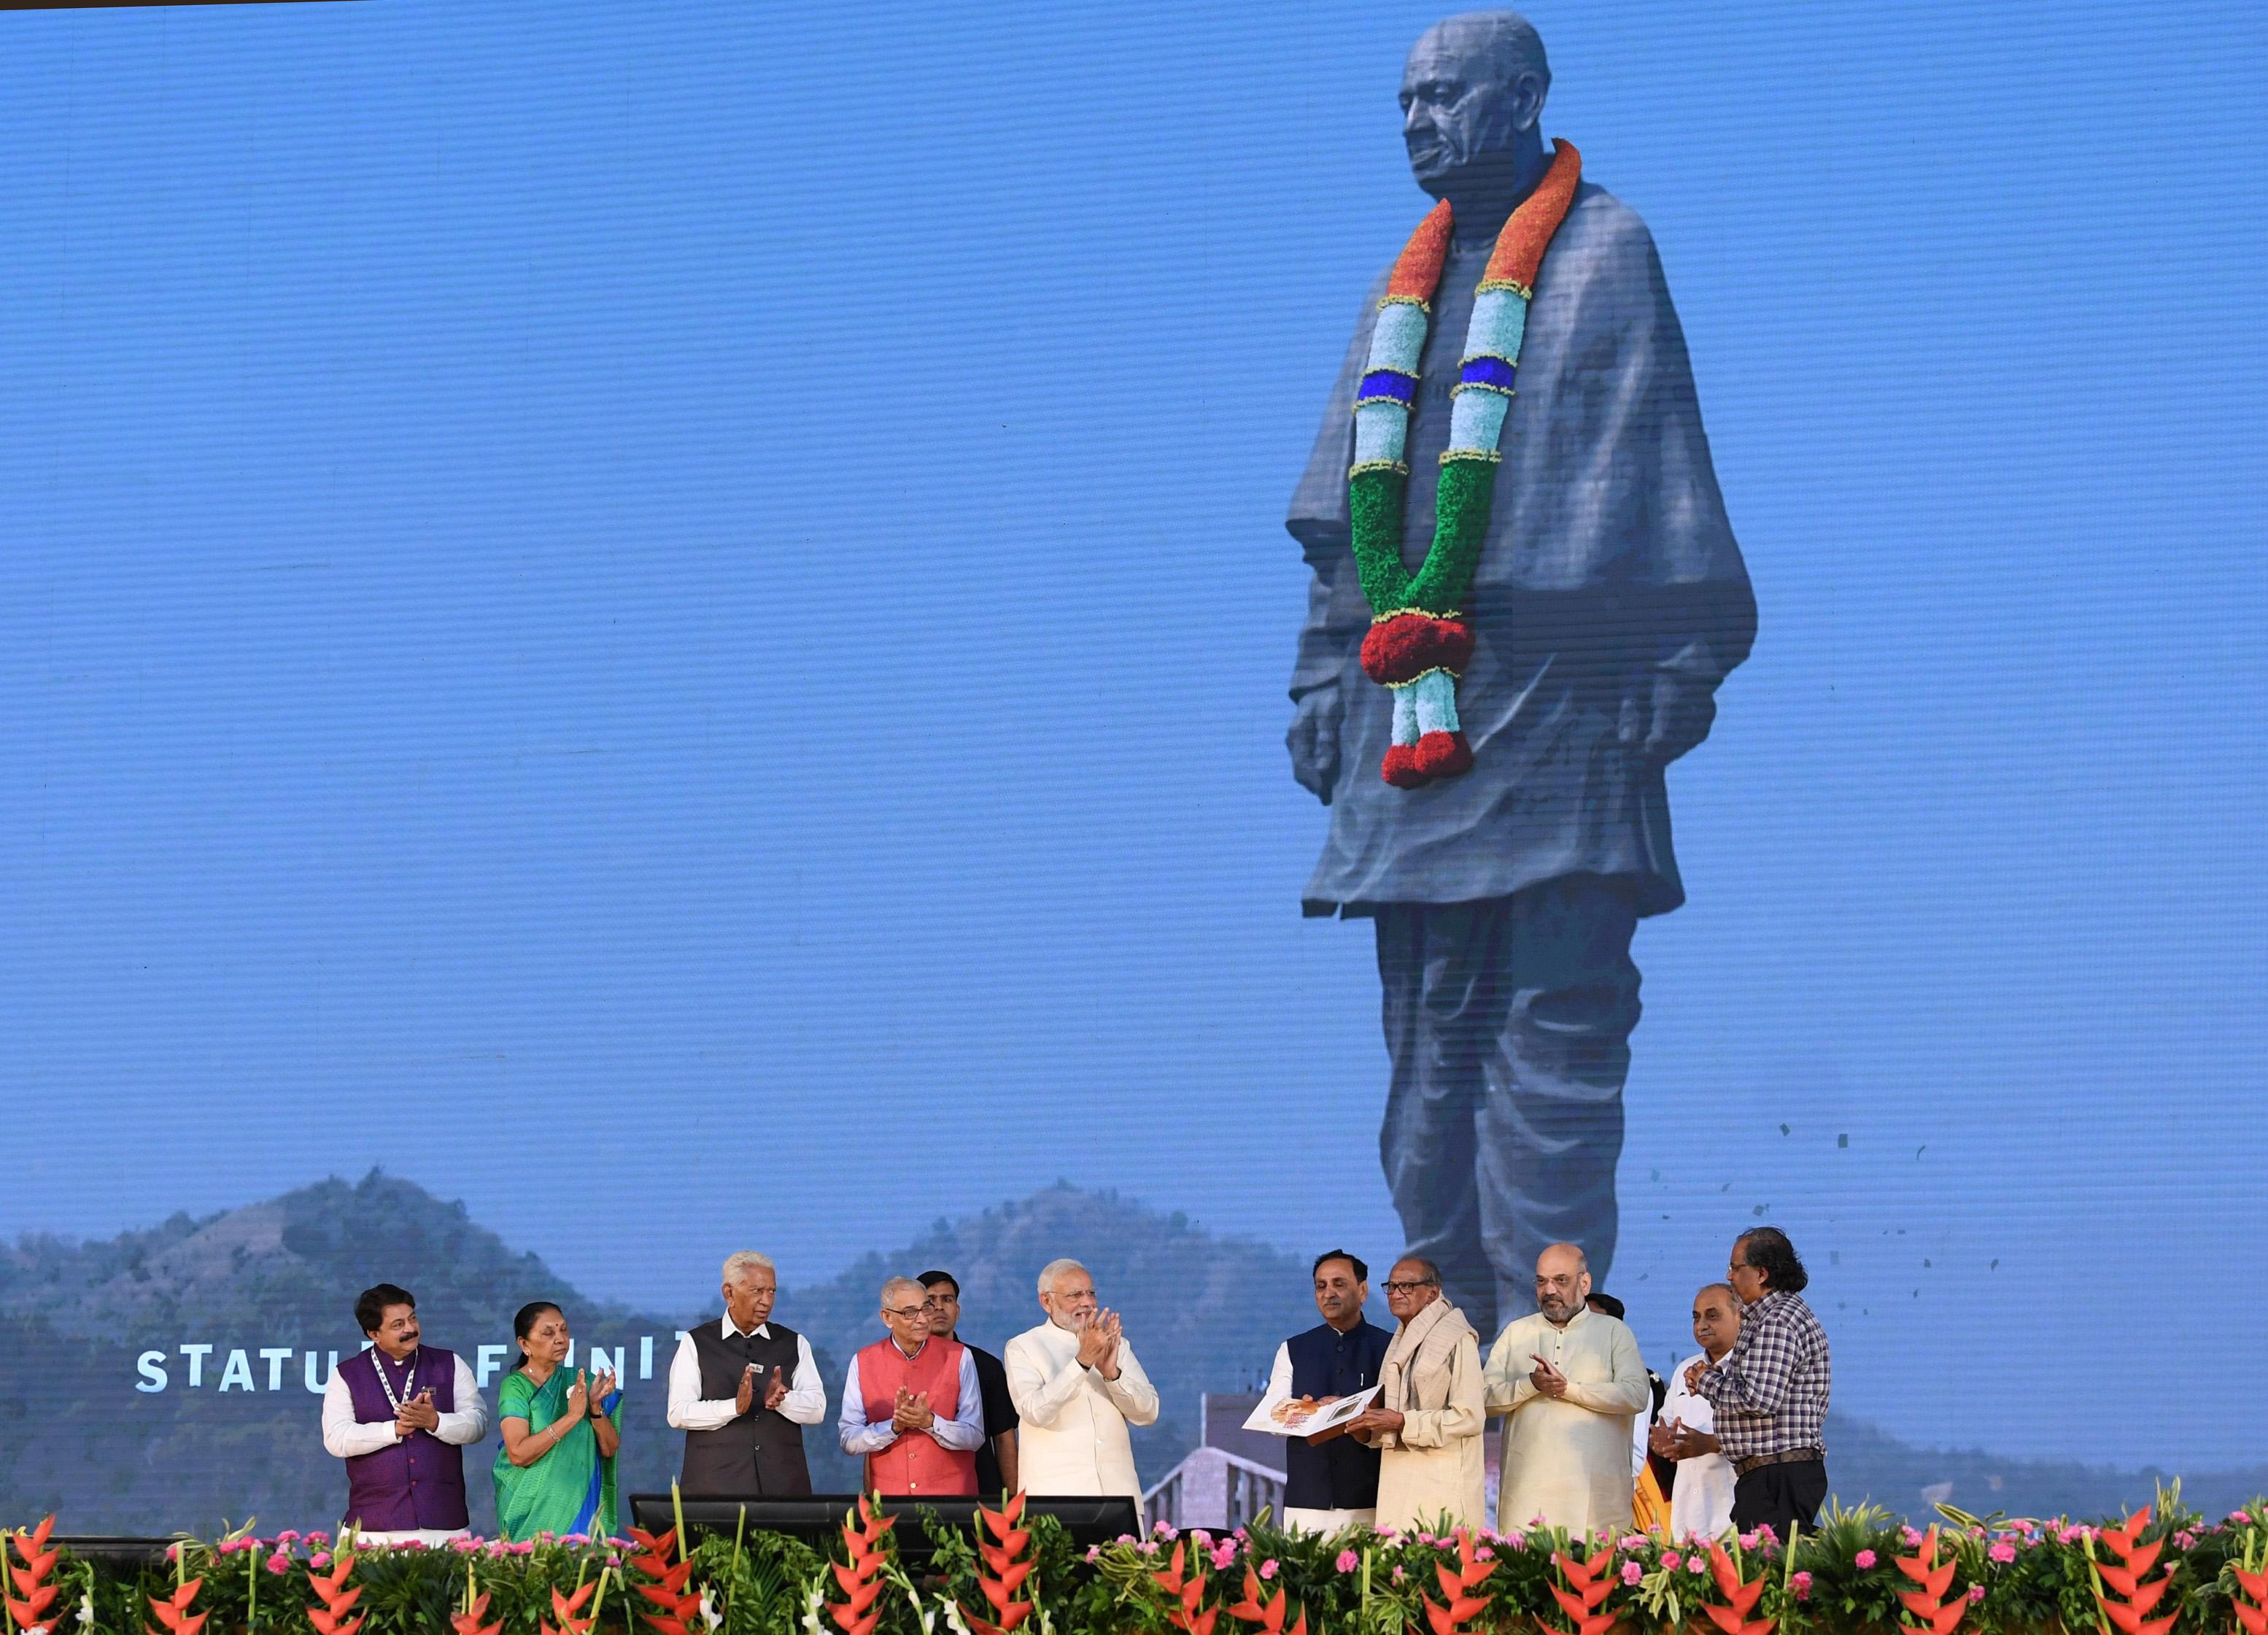 File:The Prime Minister, Shri Narendra Modi at the dedication of the  'Statue of Unity' to the Nation, on the occasion of the Rashtriya Ekta  Diwas, at Kevadiya, in Narmada District of Gujarat